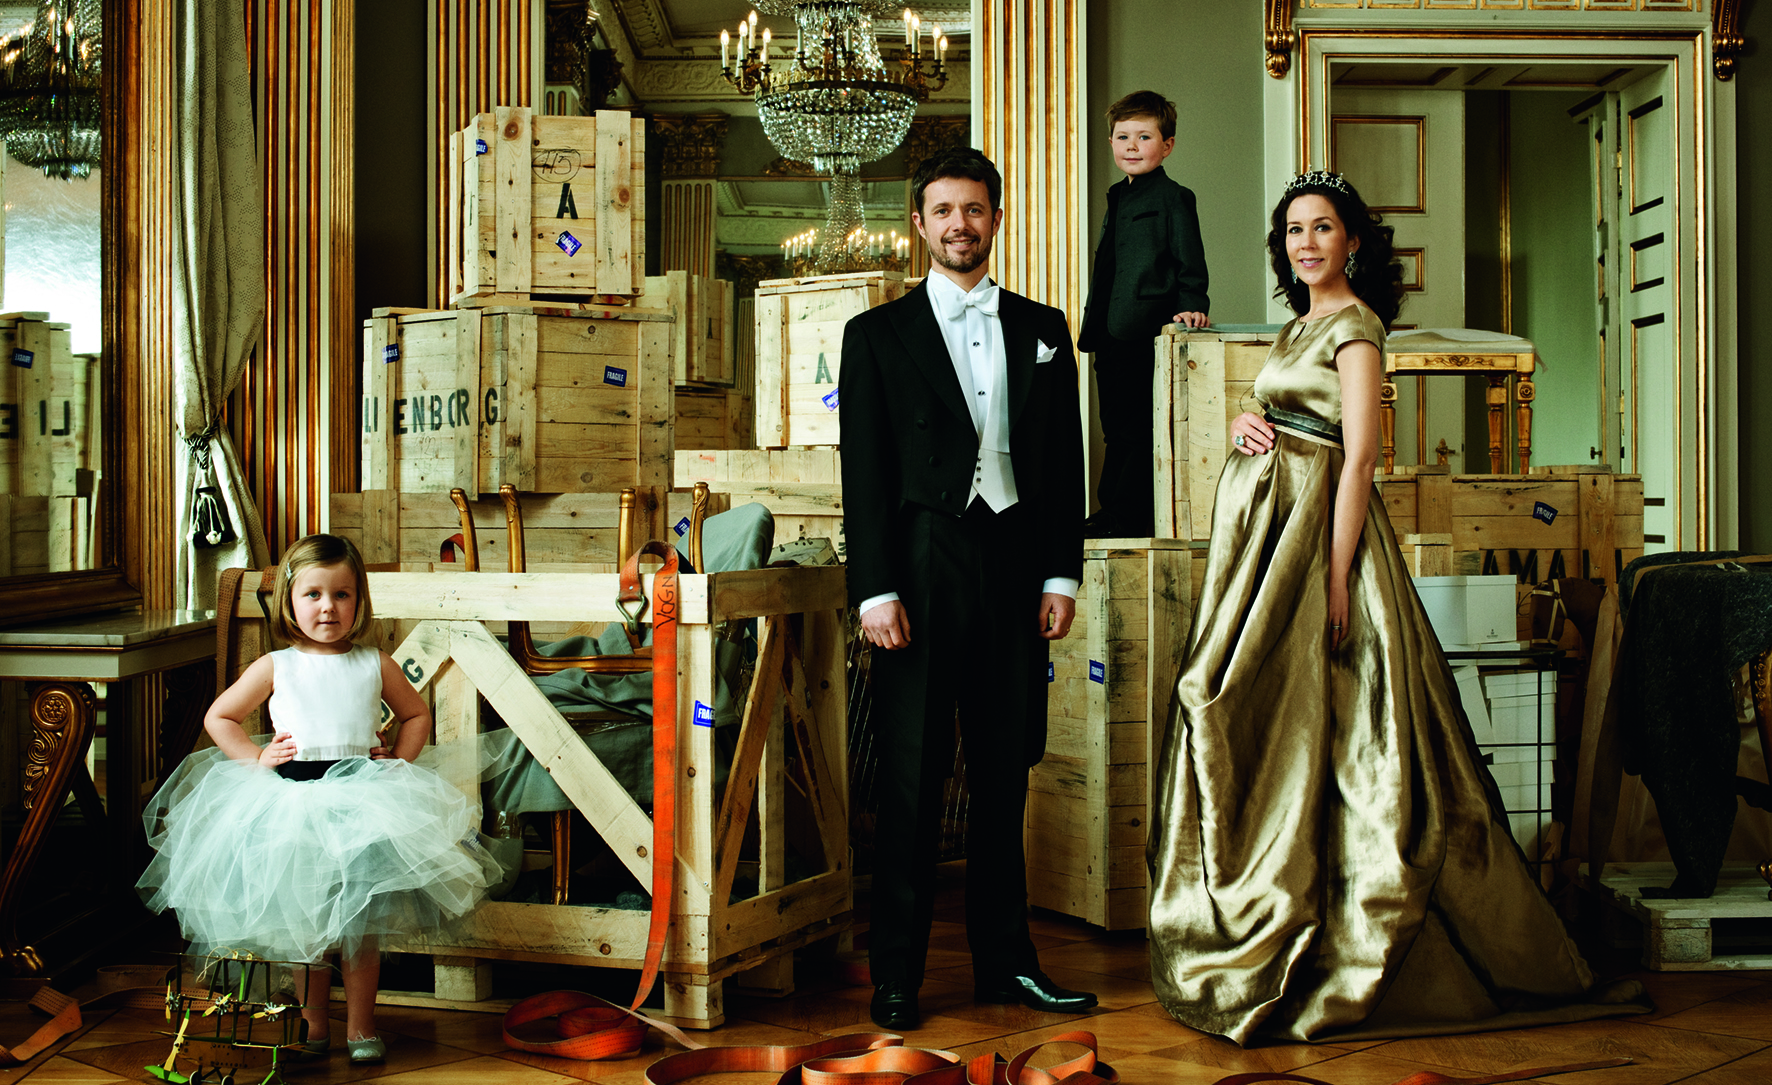 HRH Crown Prince Frederik, HRH Crown Princess Mary, HRH Prince Christian, HRH Princess Isabella Photo © 2016 Marc Hom. All rights reserved.